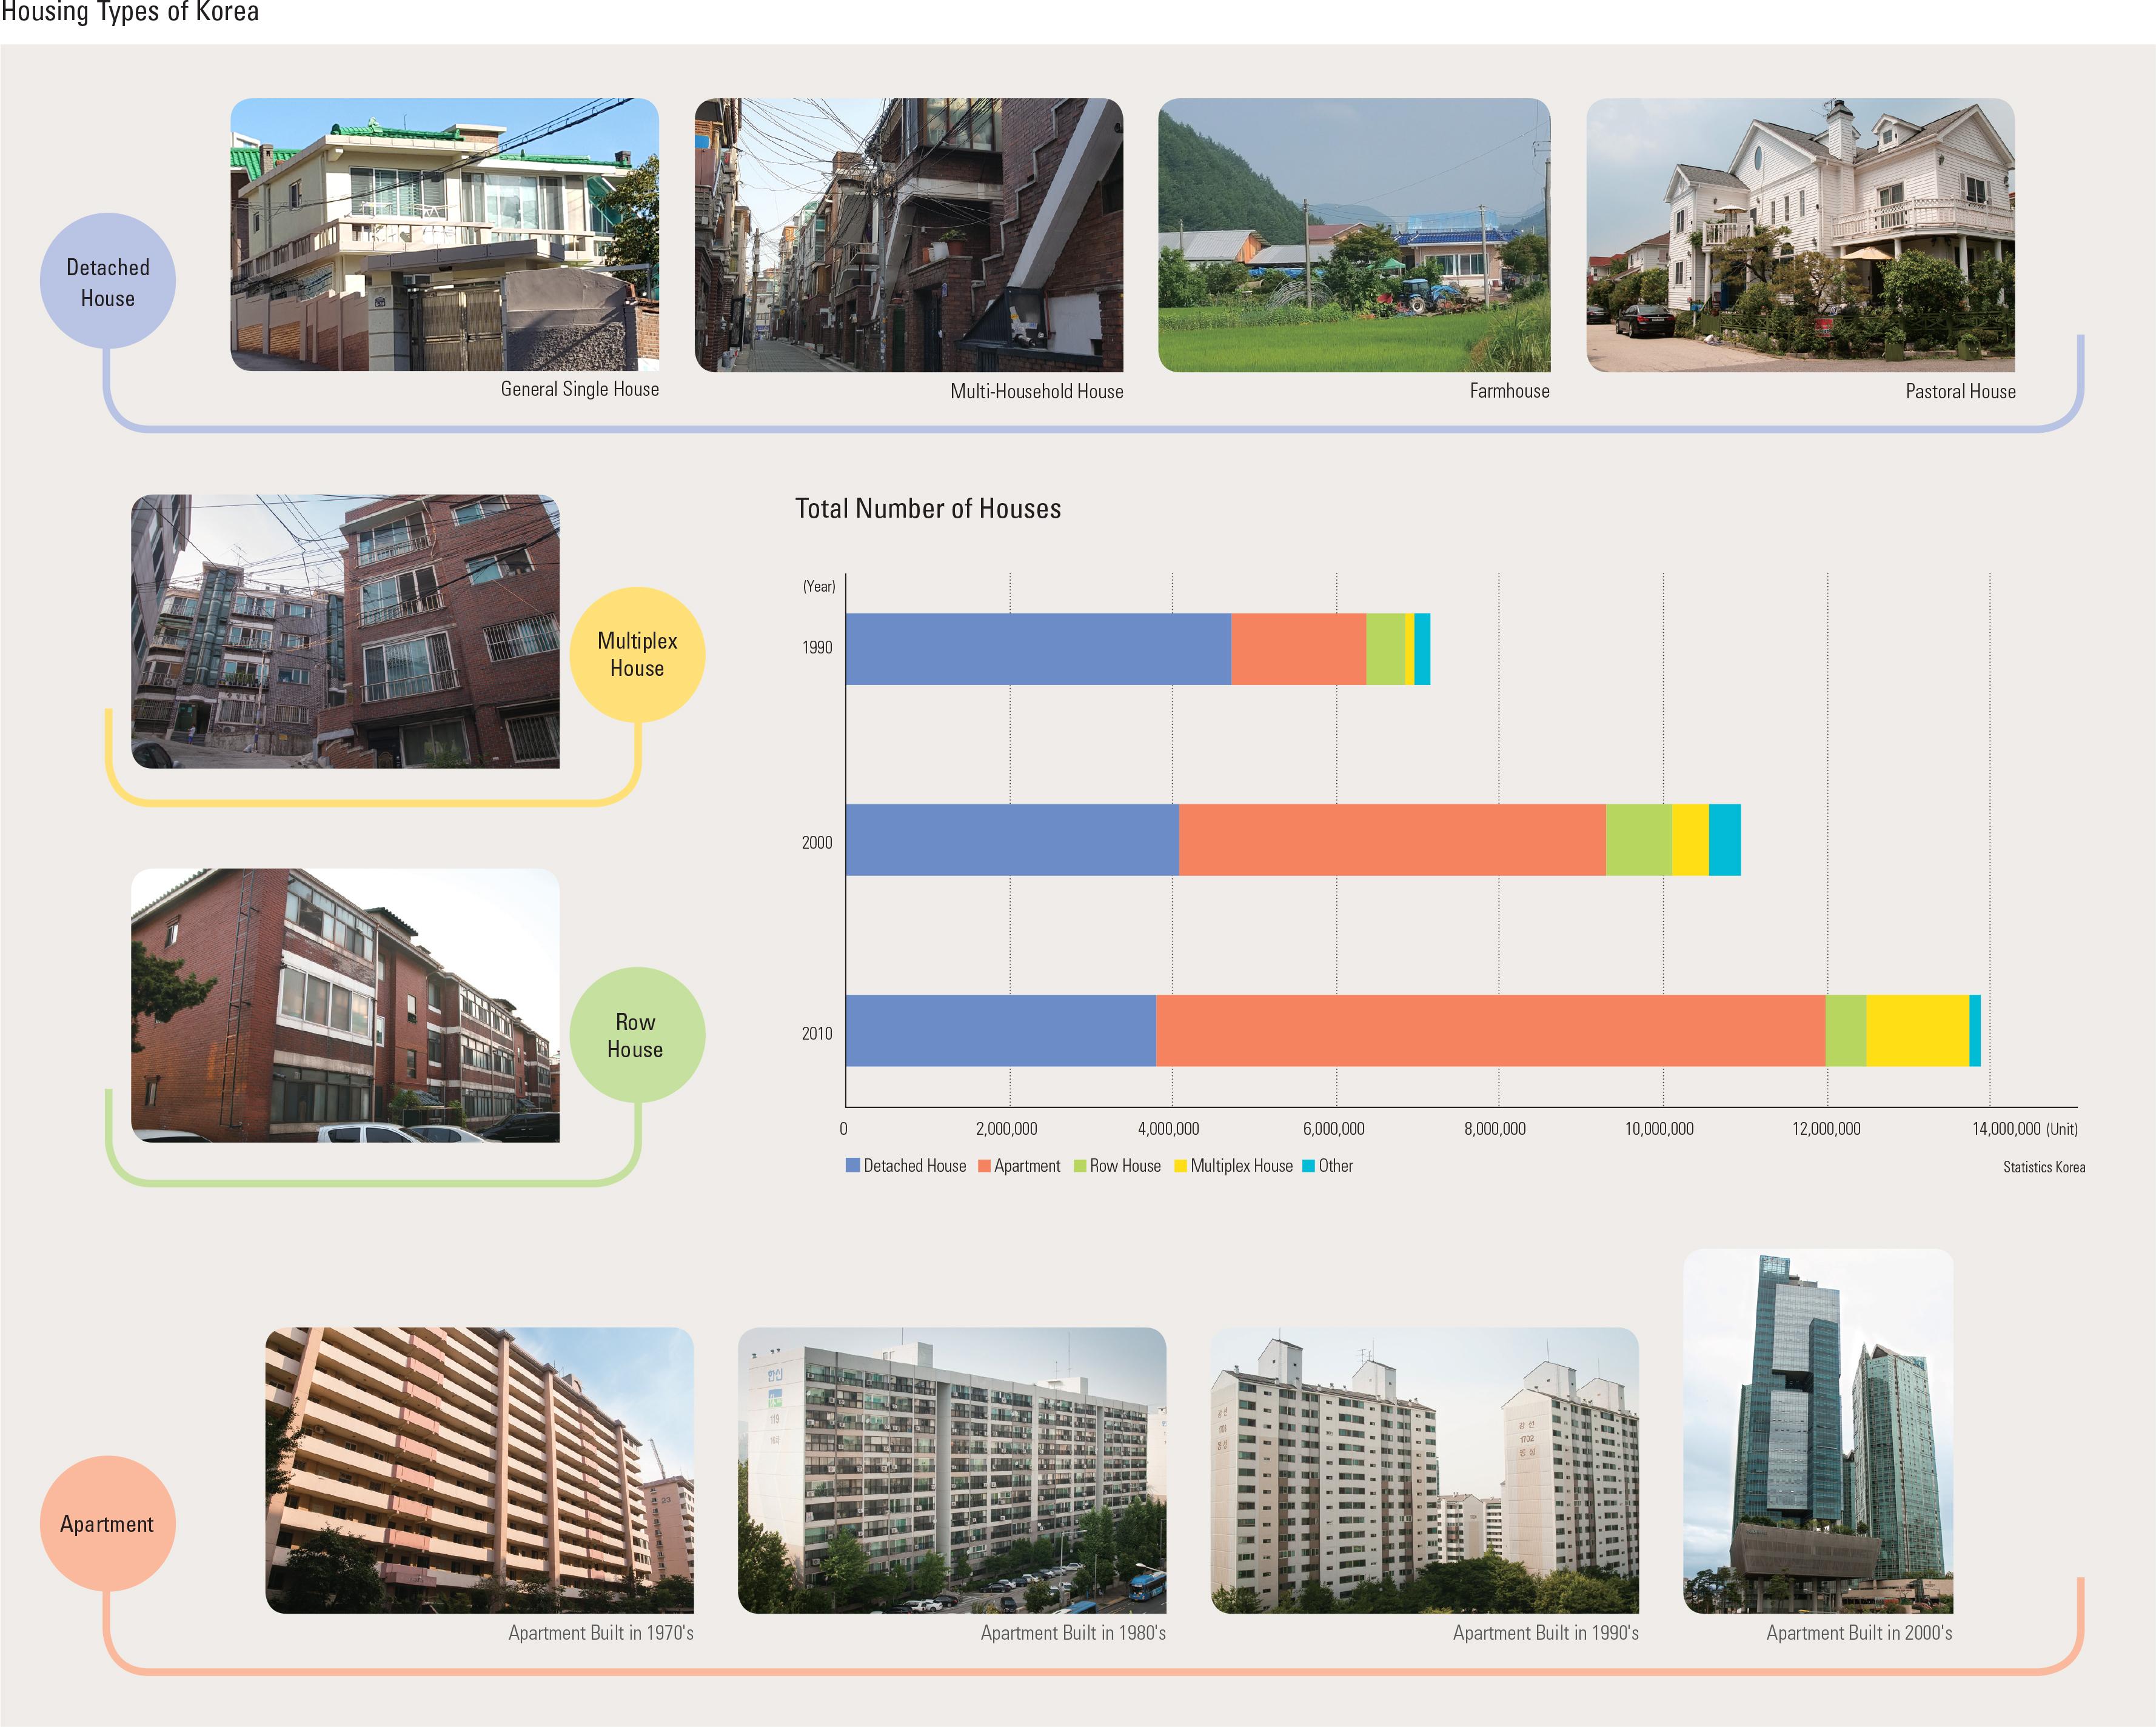 "Housing Types of Korea<p class=""oz_zoom"" zimg=""http://imagedata.cafe24.com/us_3/us3_210-1_2.jpg""><span style=""font-family:Nanum Myeongjo;""><span style=""font-size:18px;""><span class=""label label-danger"">UPDATE DATA</span></span></p>"